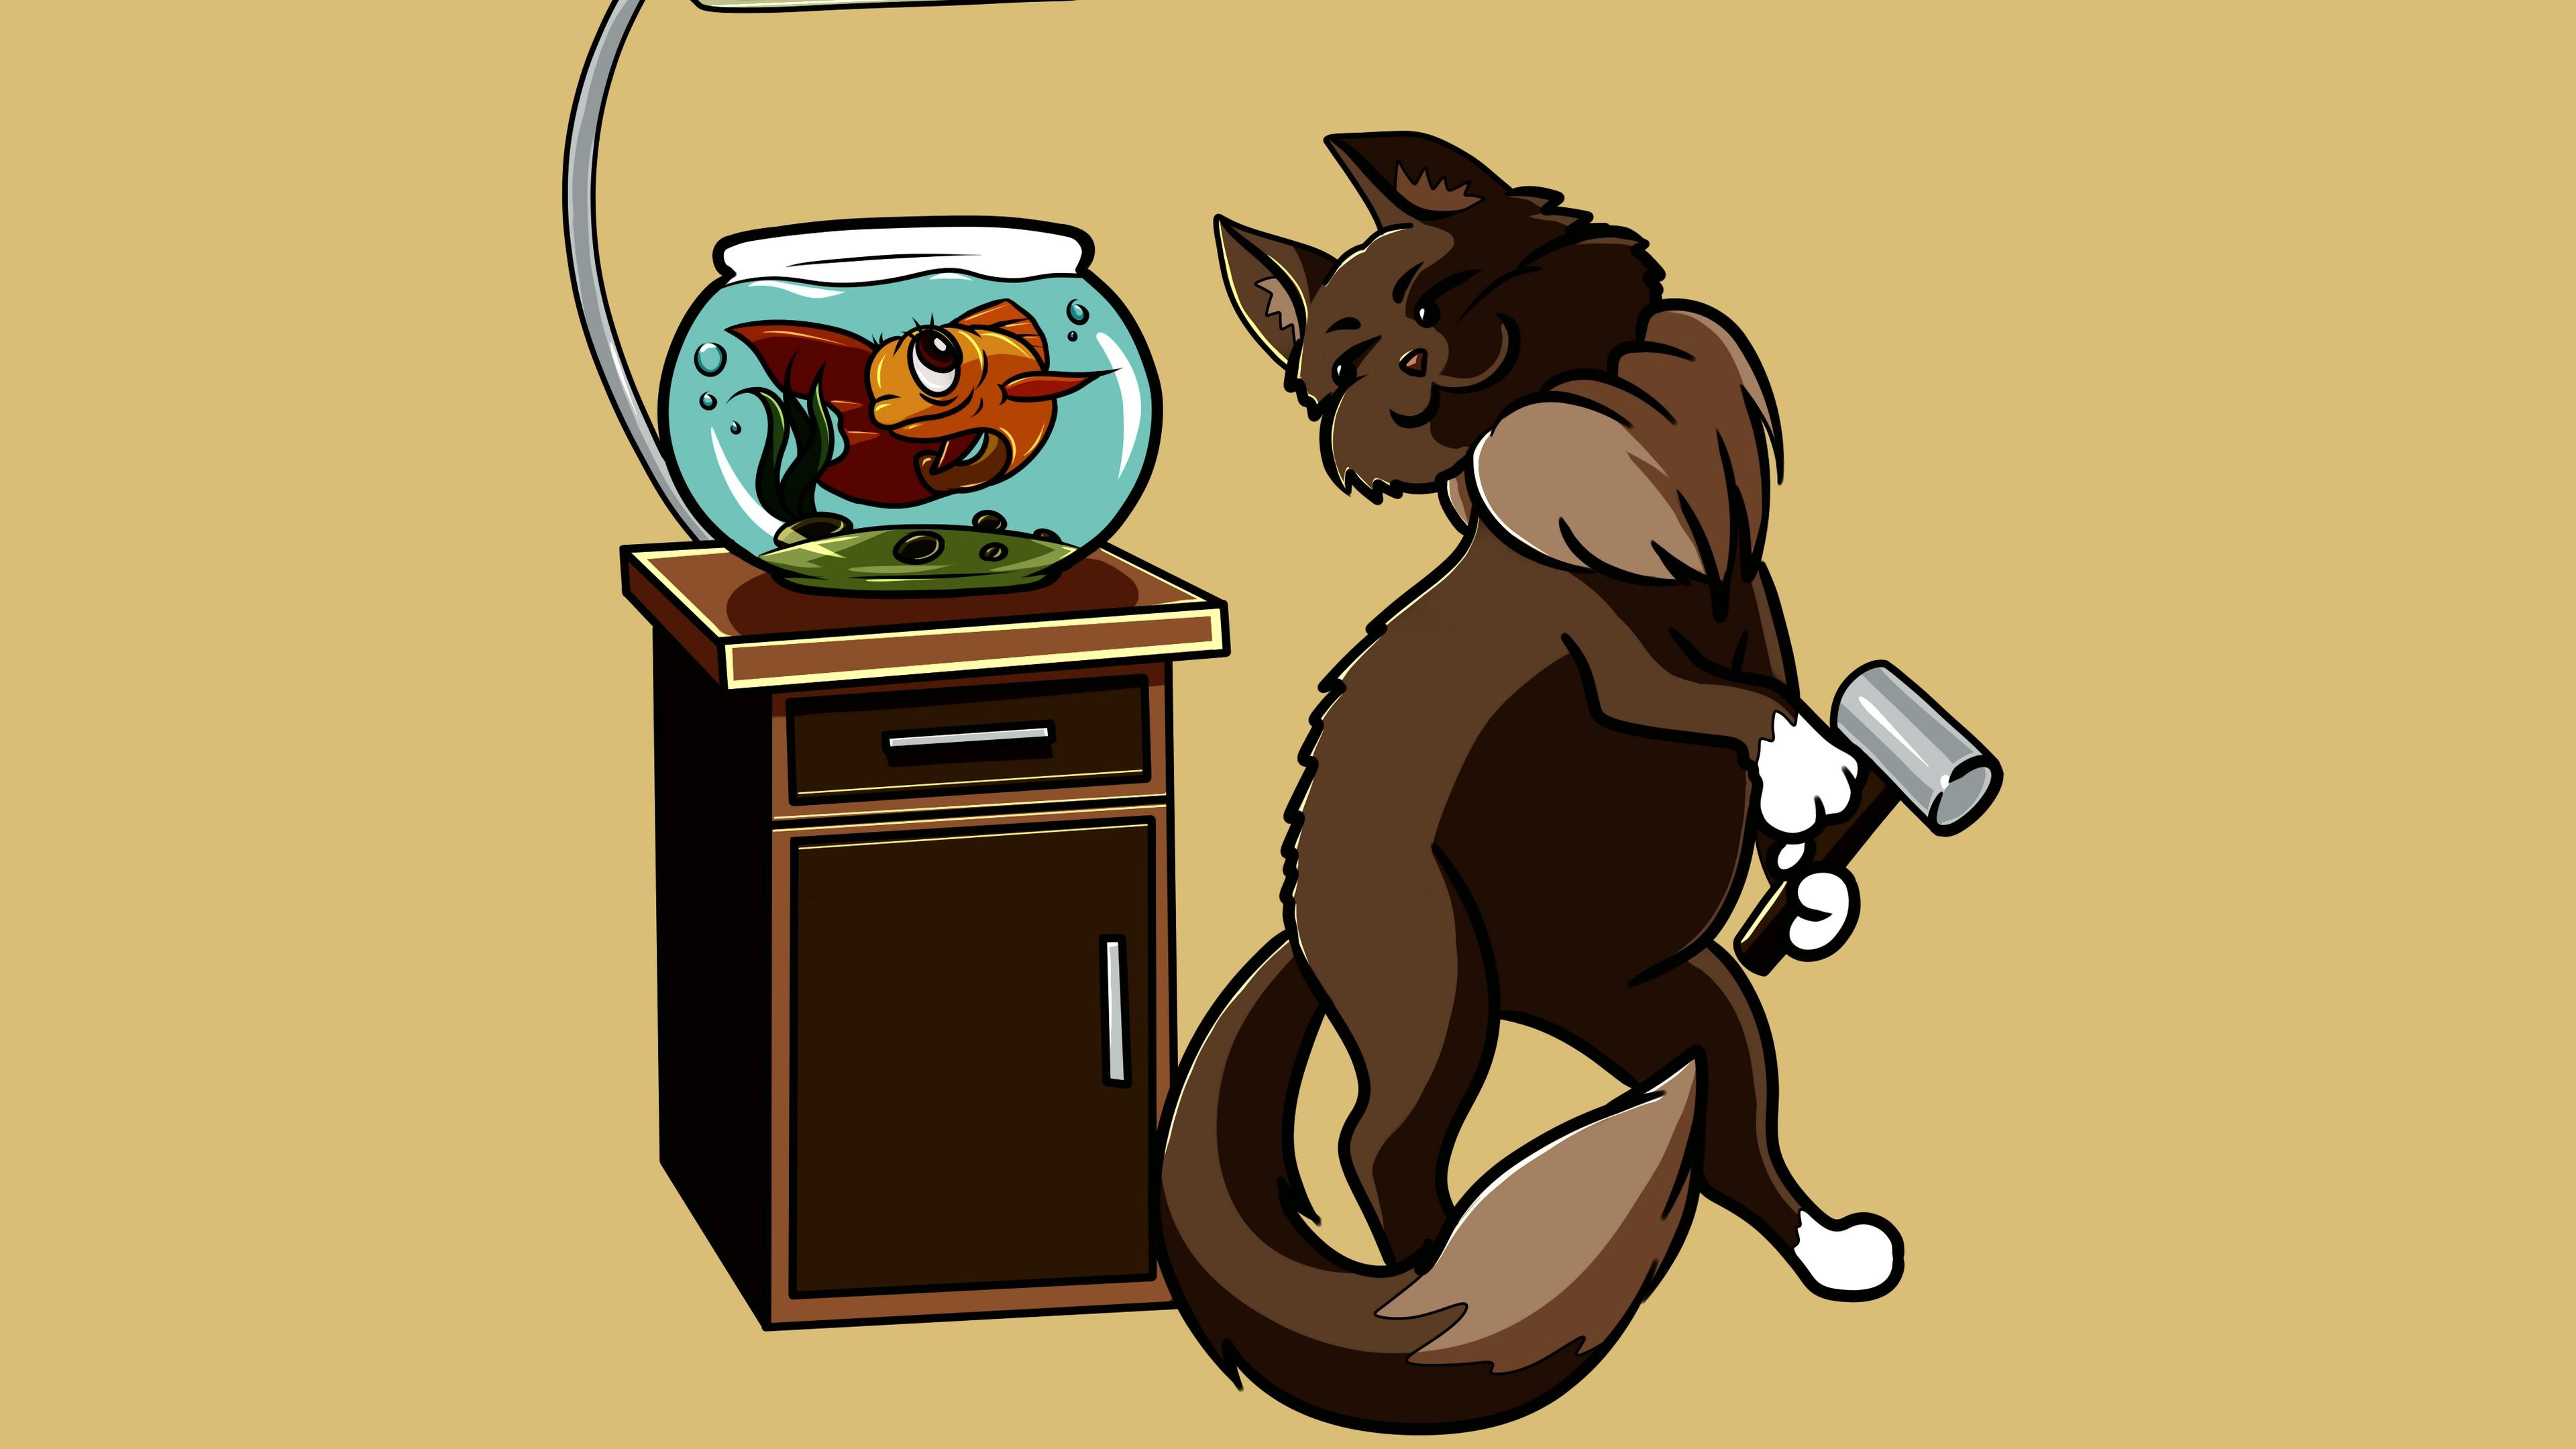 cat fish aquarium funny art friends 4k 1541971219 - cat, fish, aquarium, funny, art, friends 4k - Fish, Cat, Aquarium